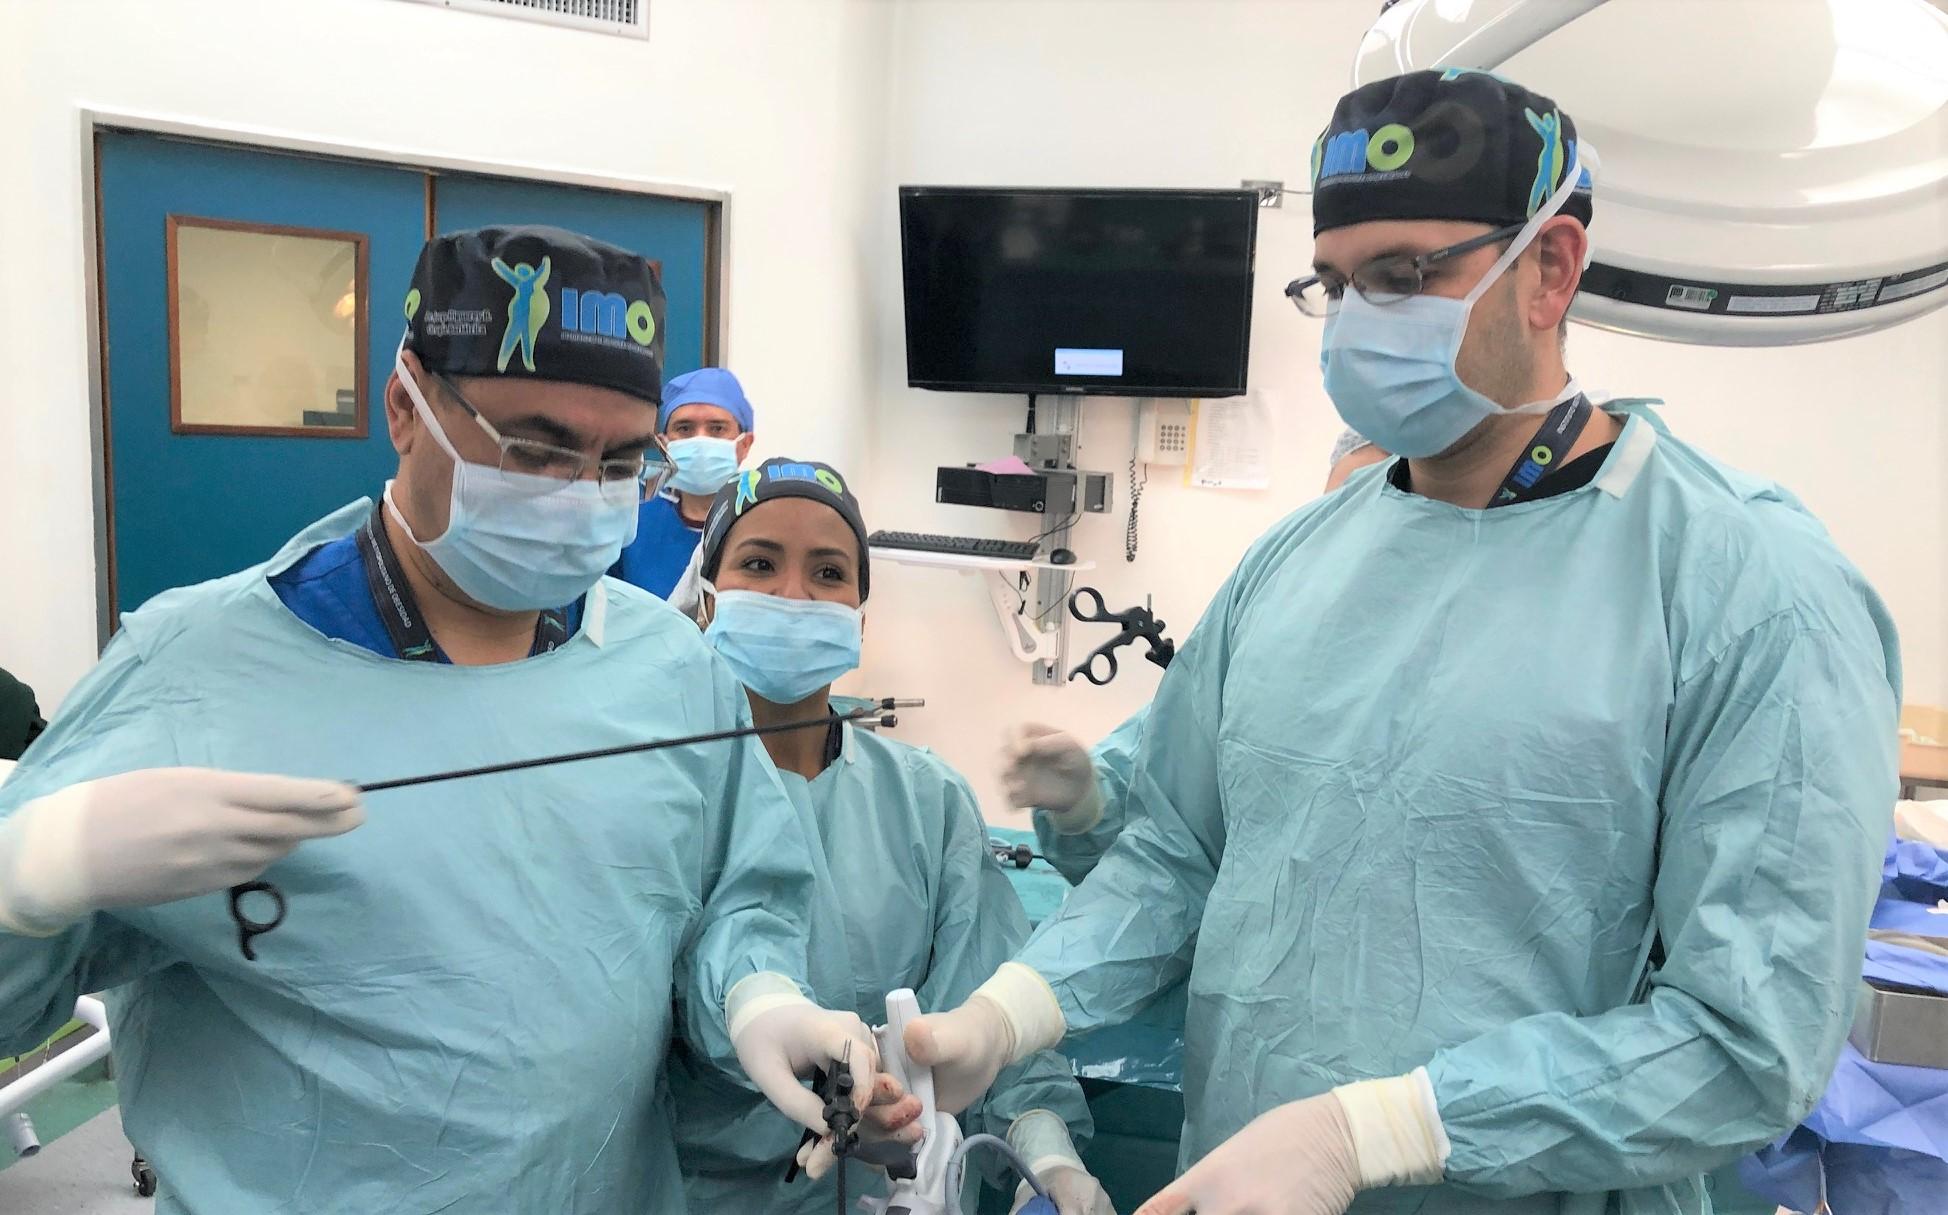 DOCTORES OPERANDO